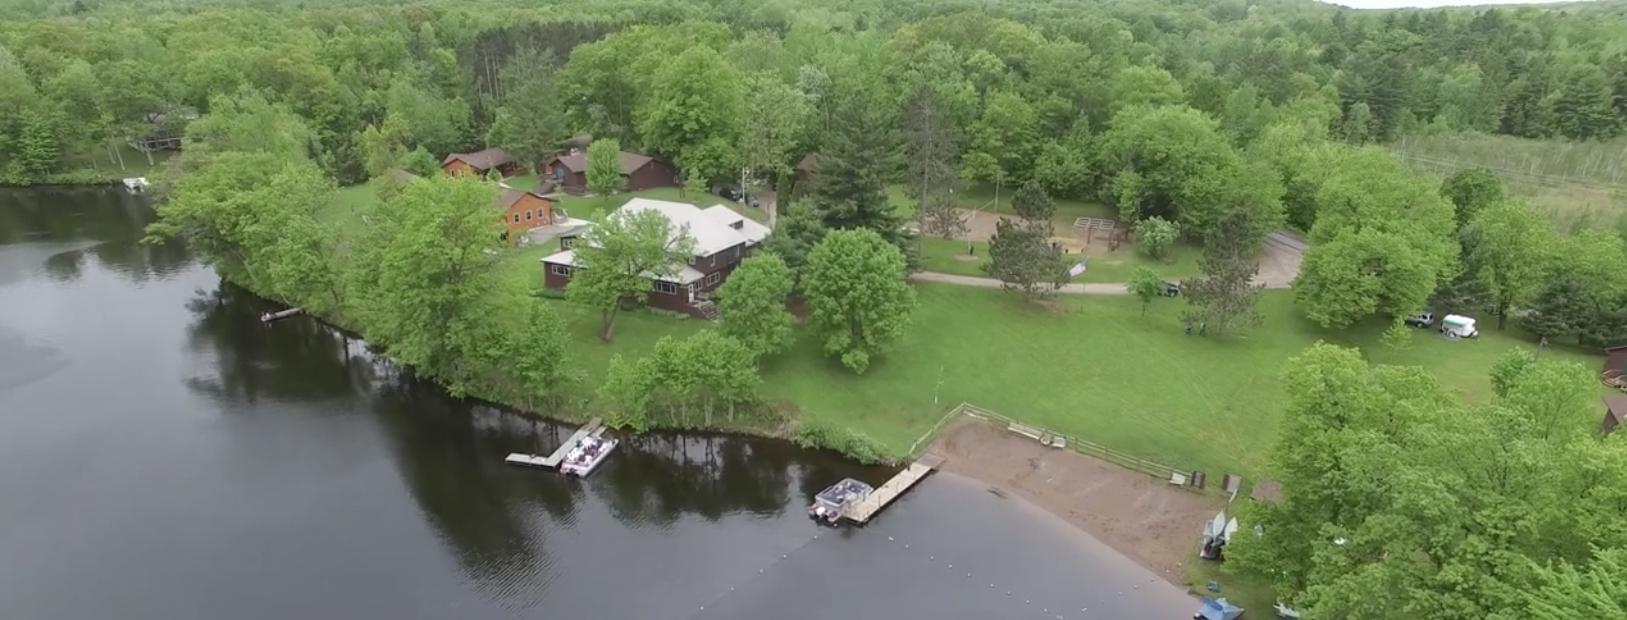 Christian retreat center Wisconsin